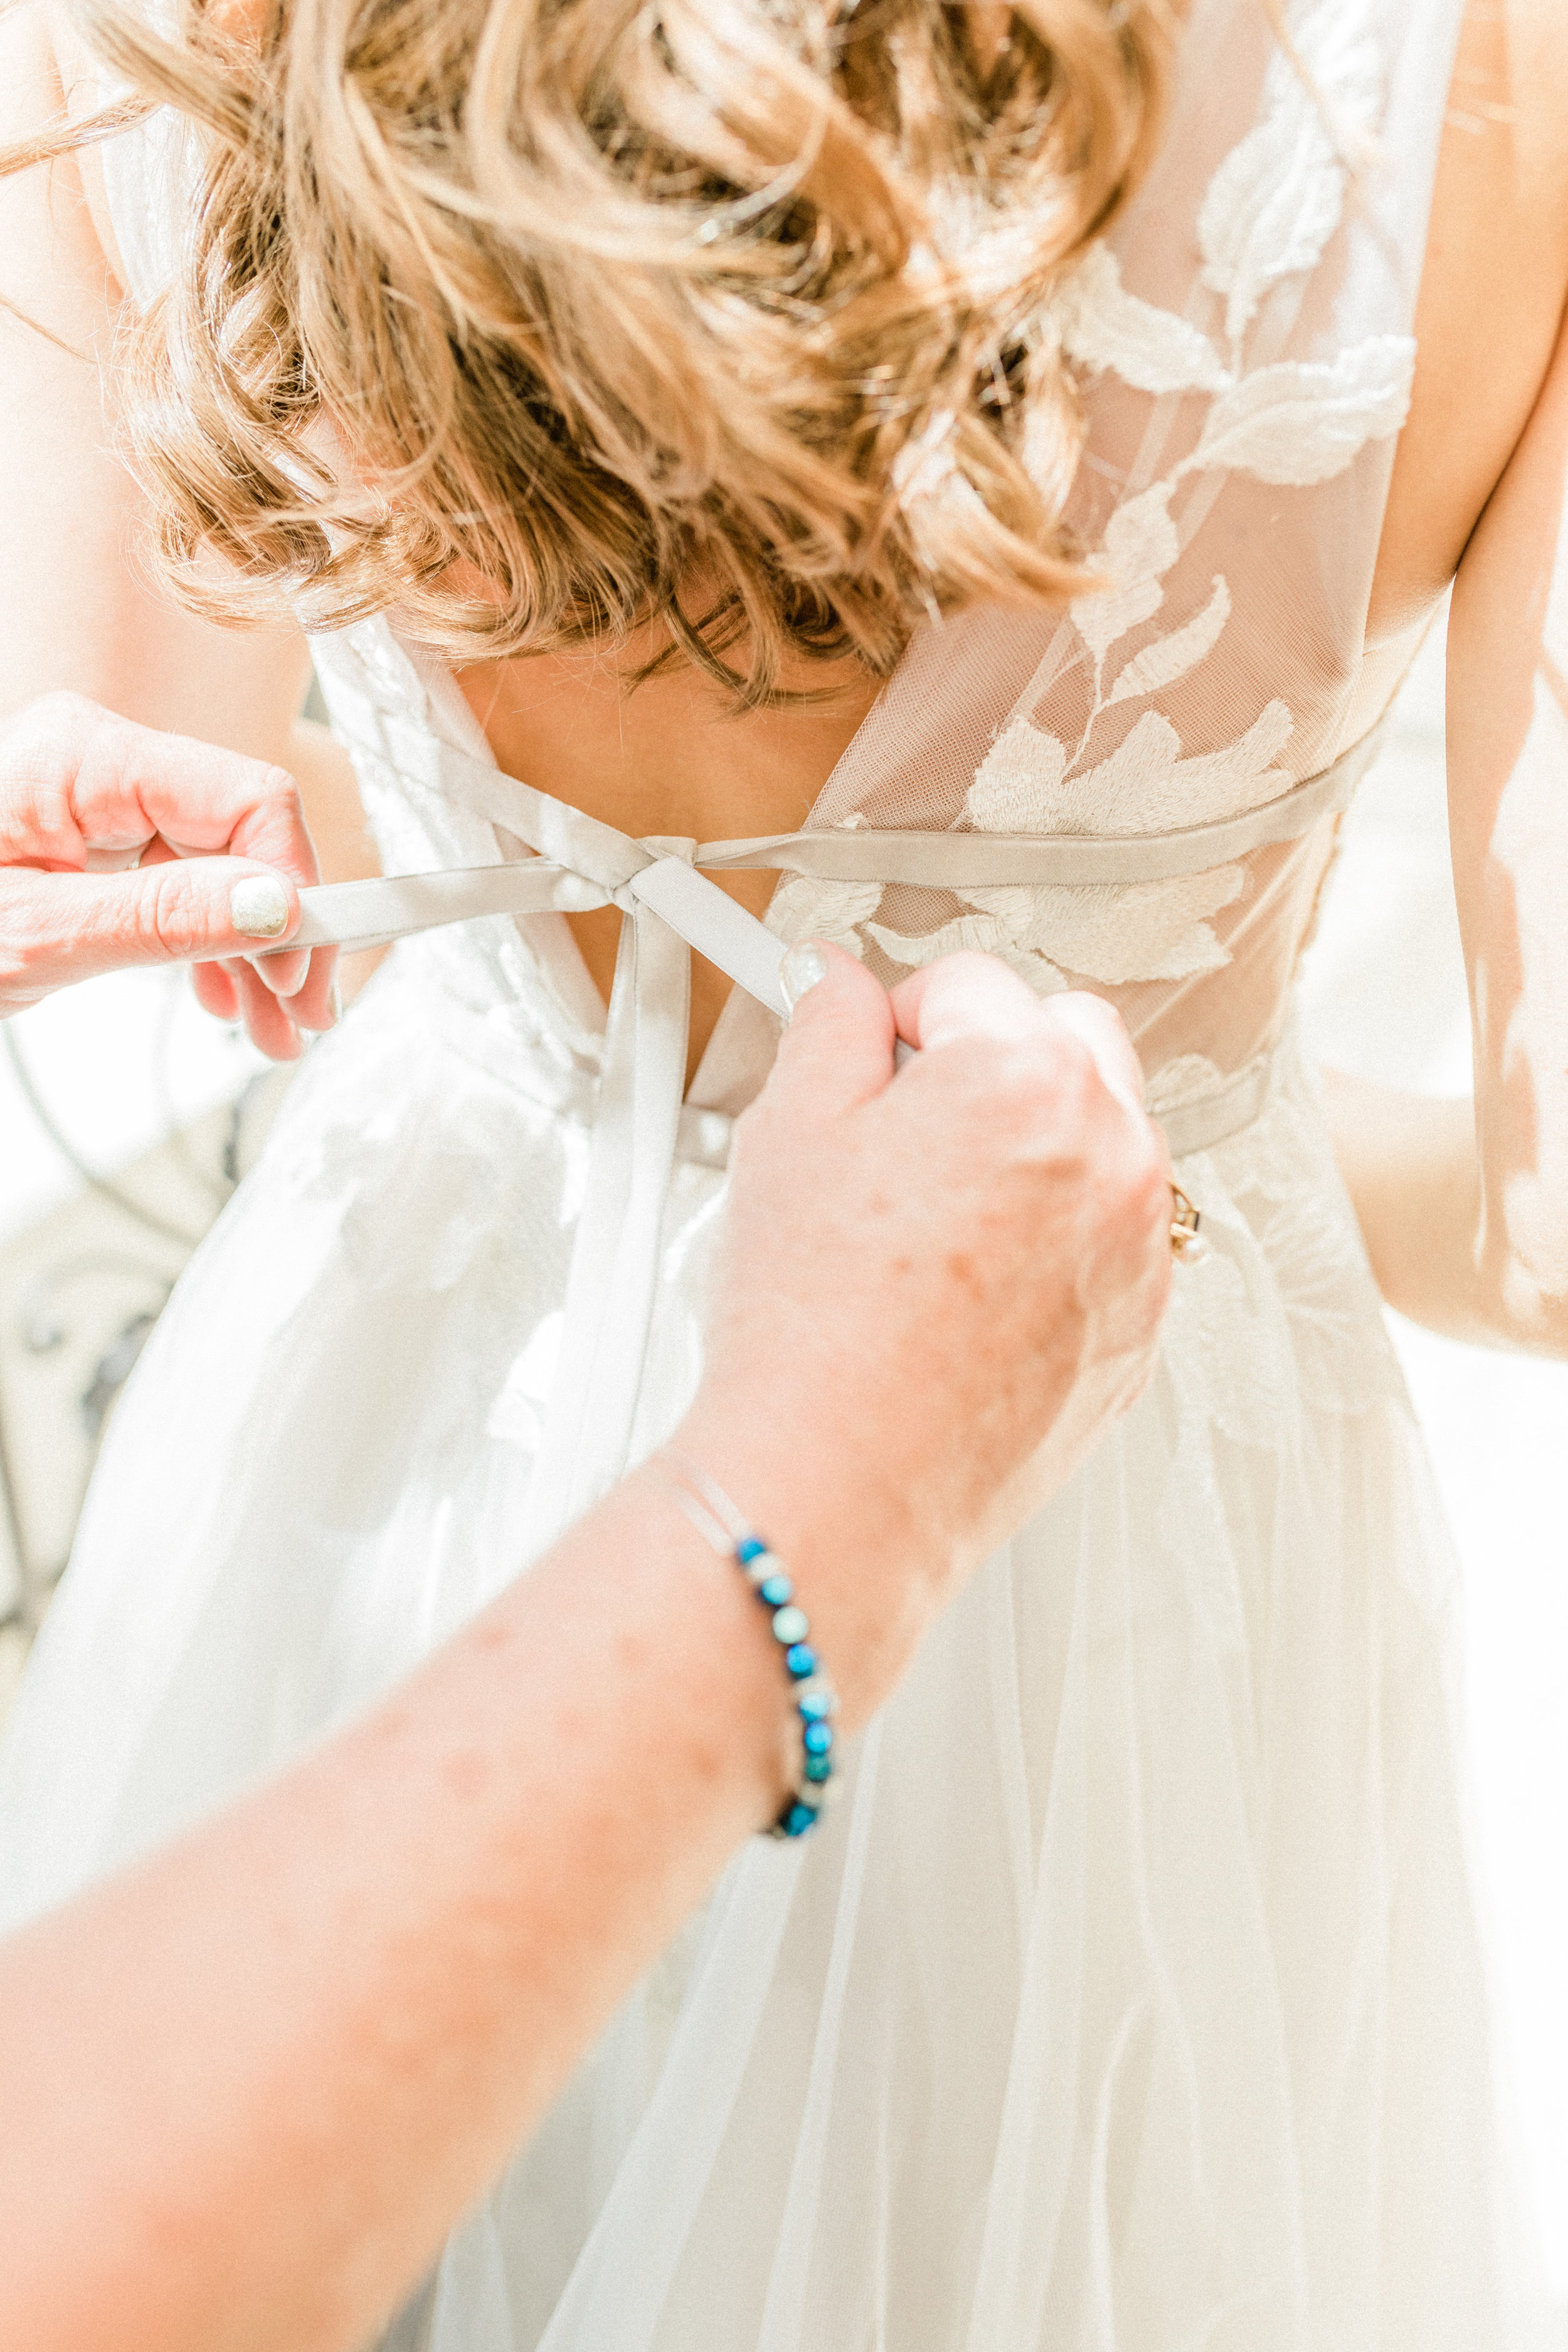 Mallory and Aaron - Married - Sneaks - Lauren Alisse Photography-11.jpg